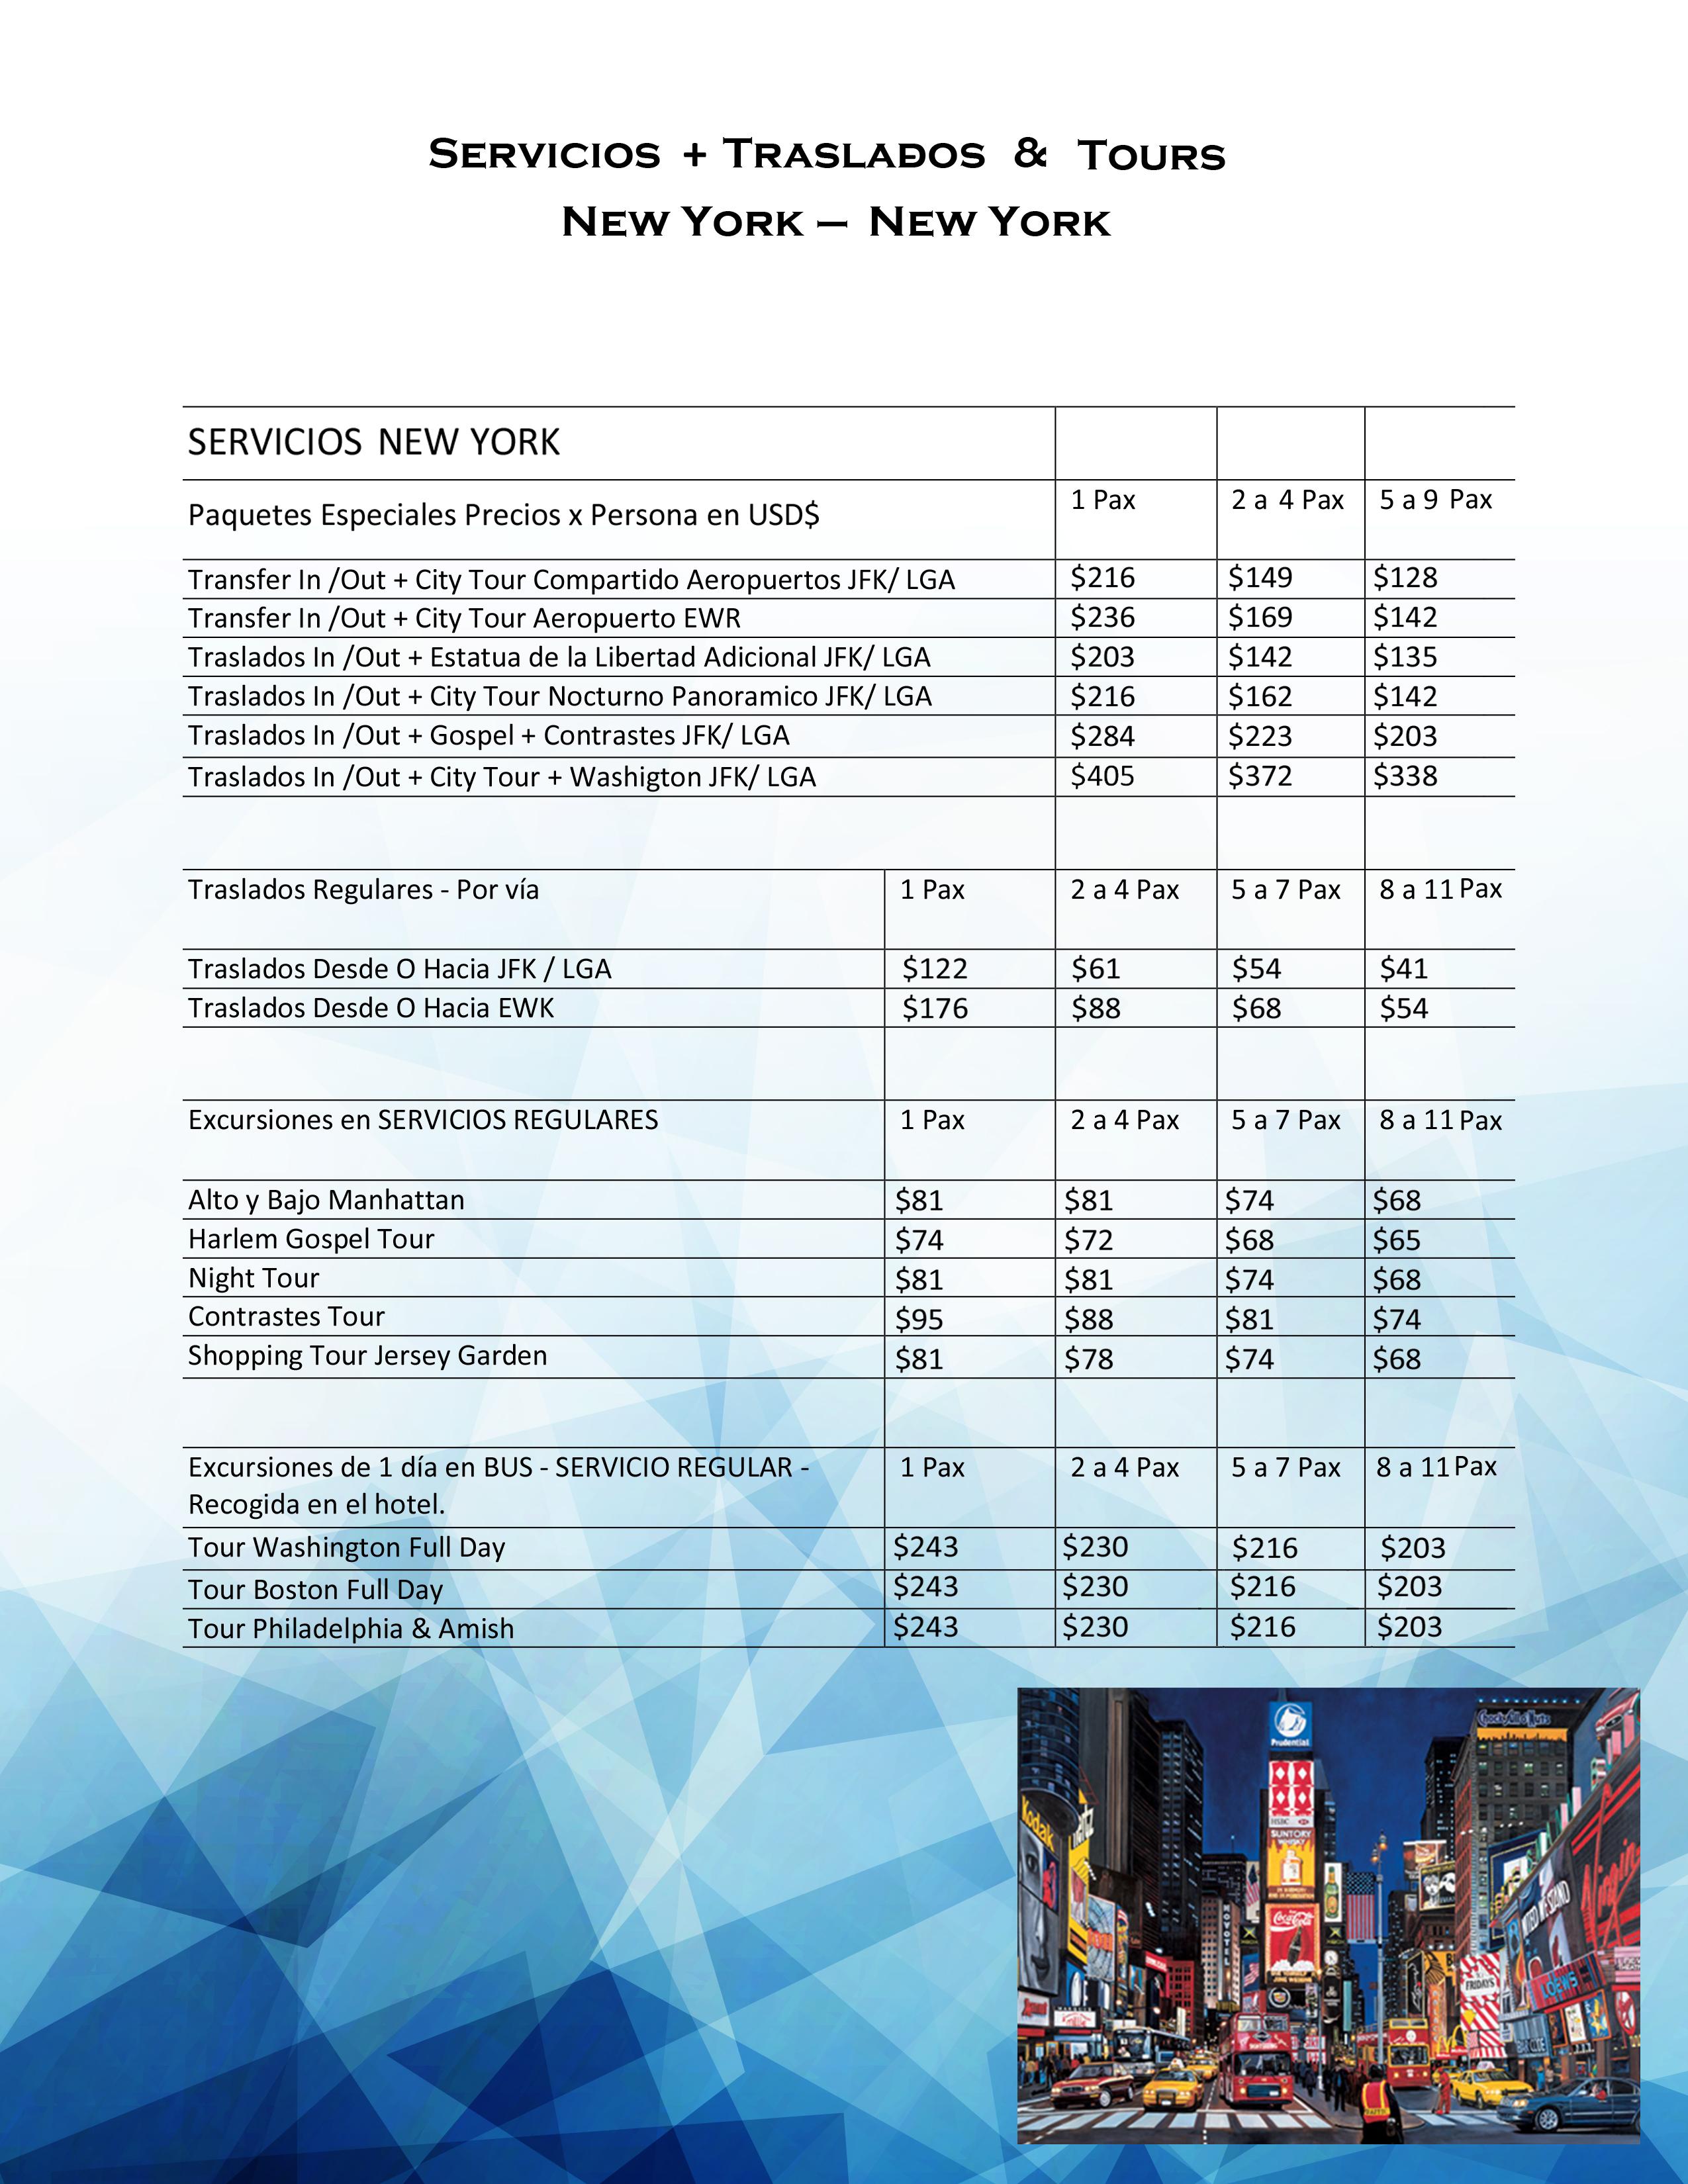 Servicios & traslados + Tours New York - Costa Este1